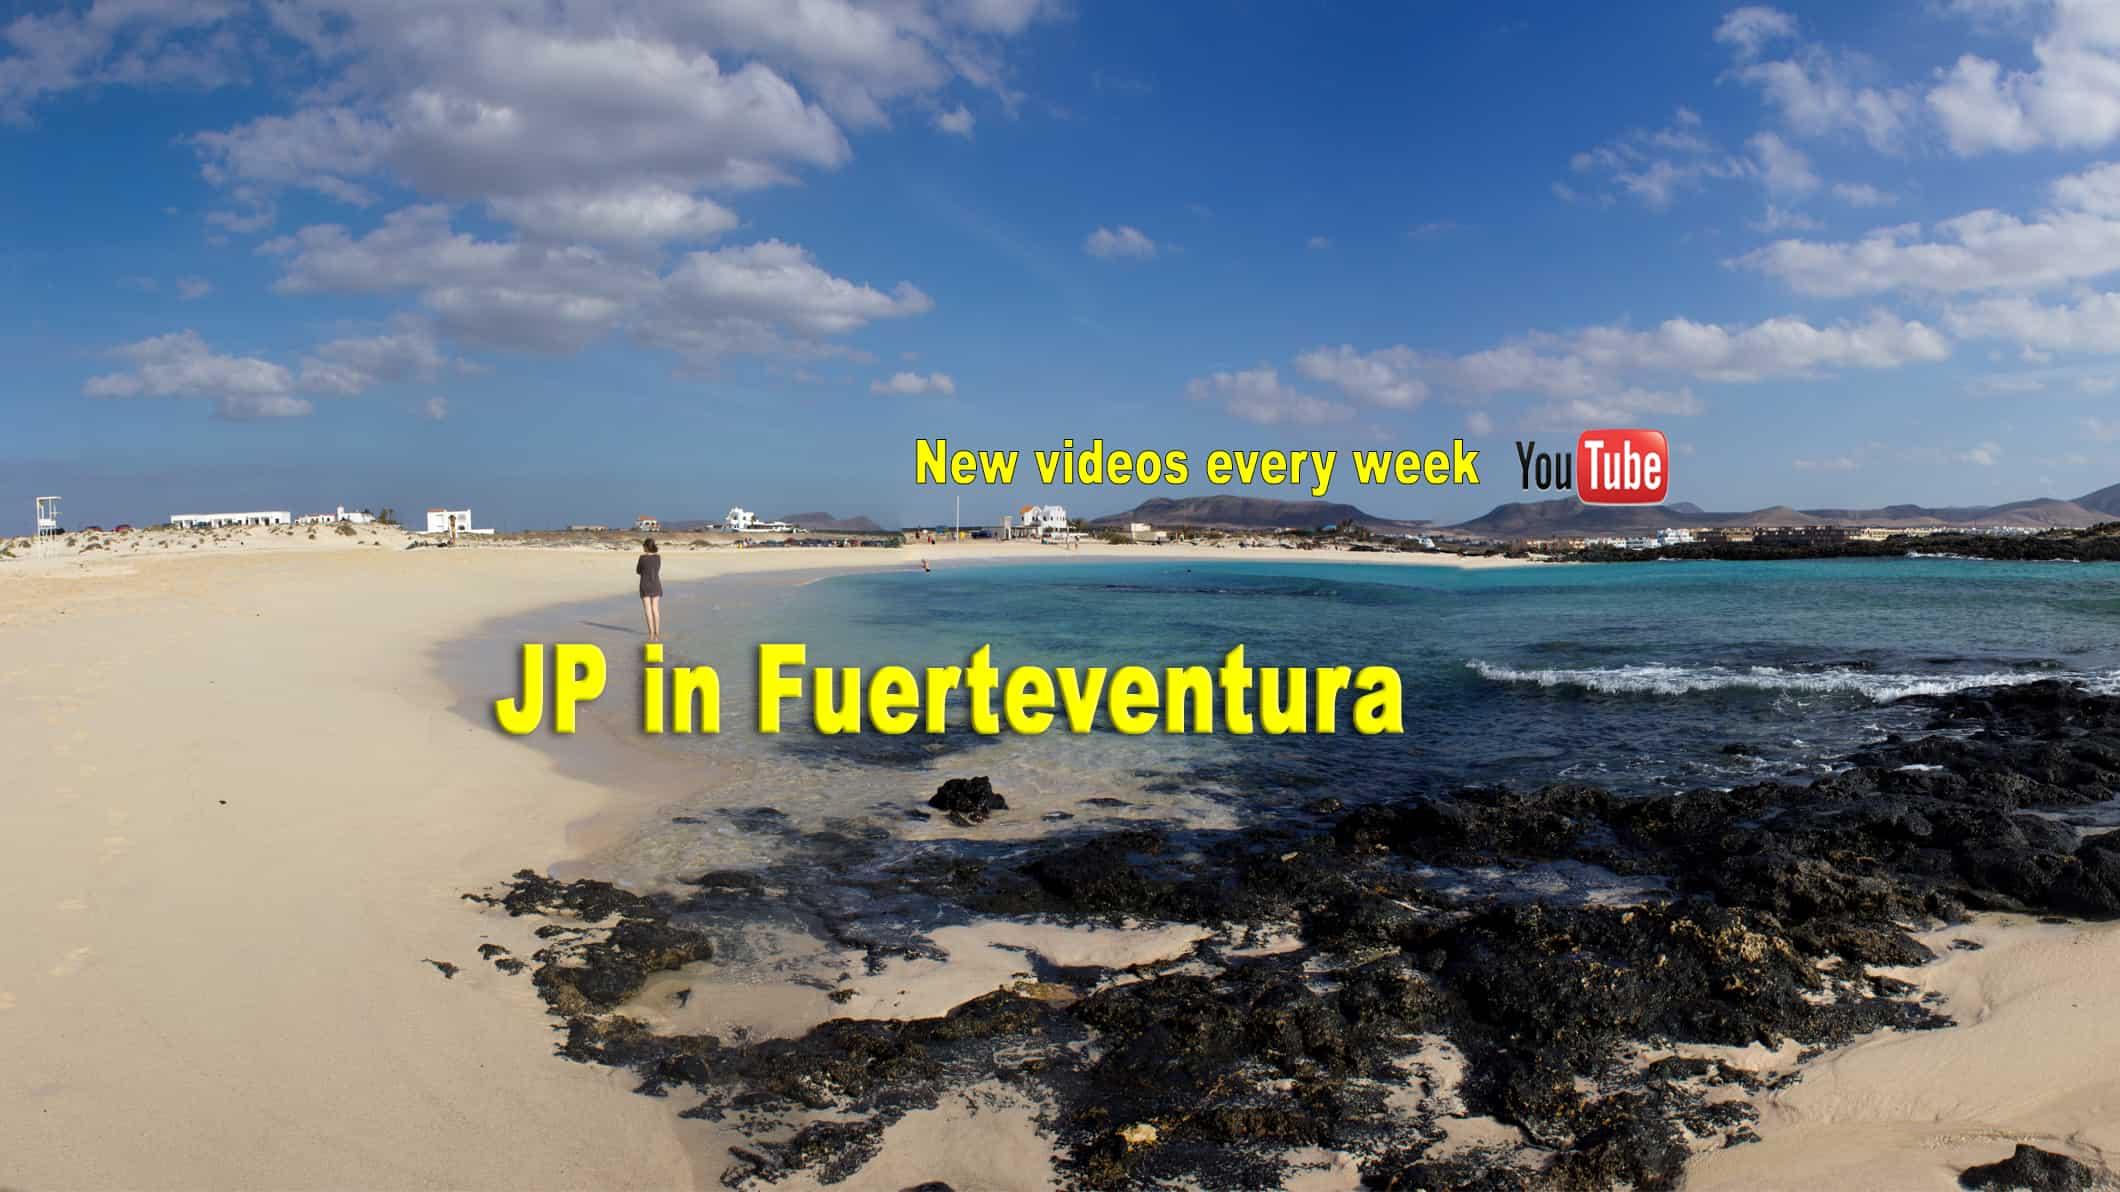 JPinFuerteventura Youtube